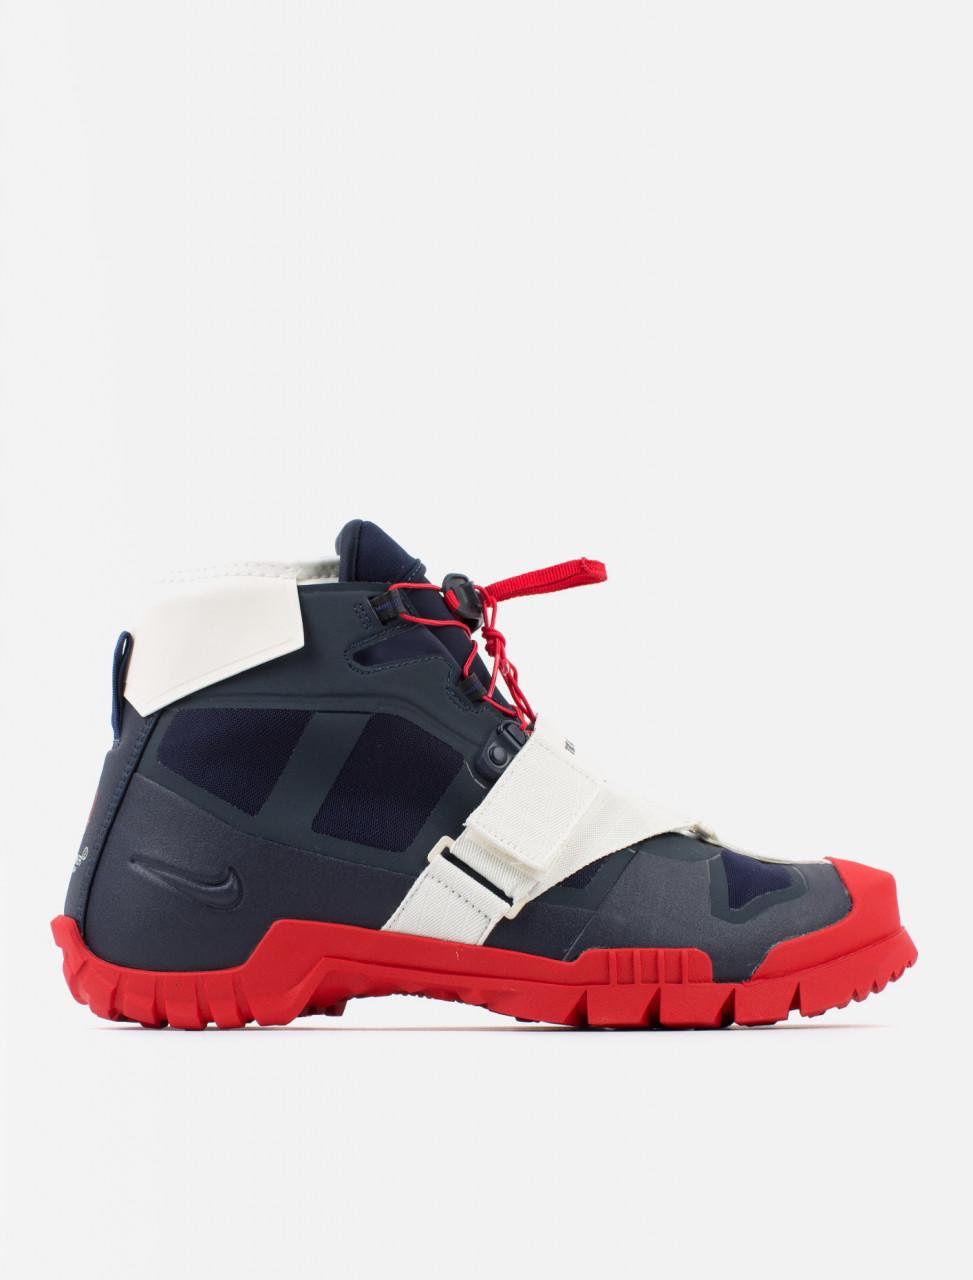 x Undercover SFB Mountain Sneaker